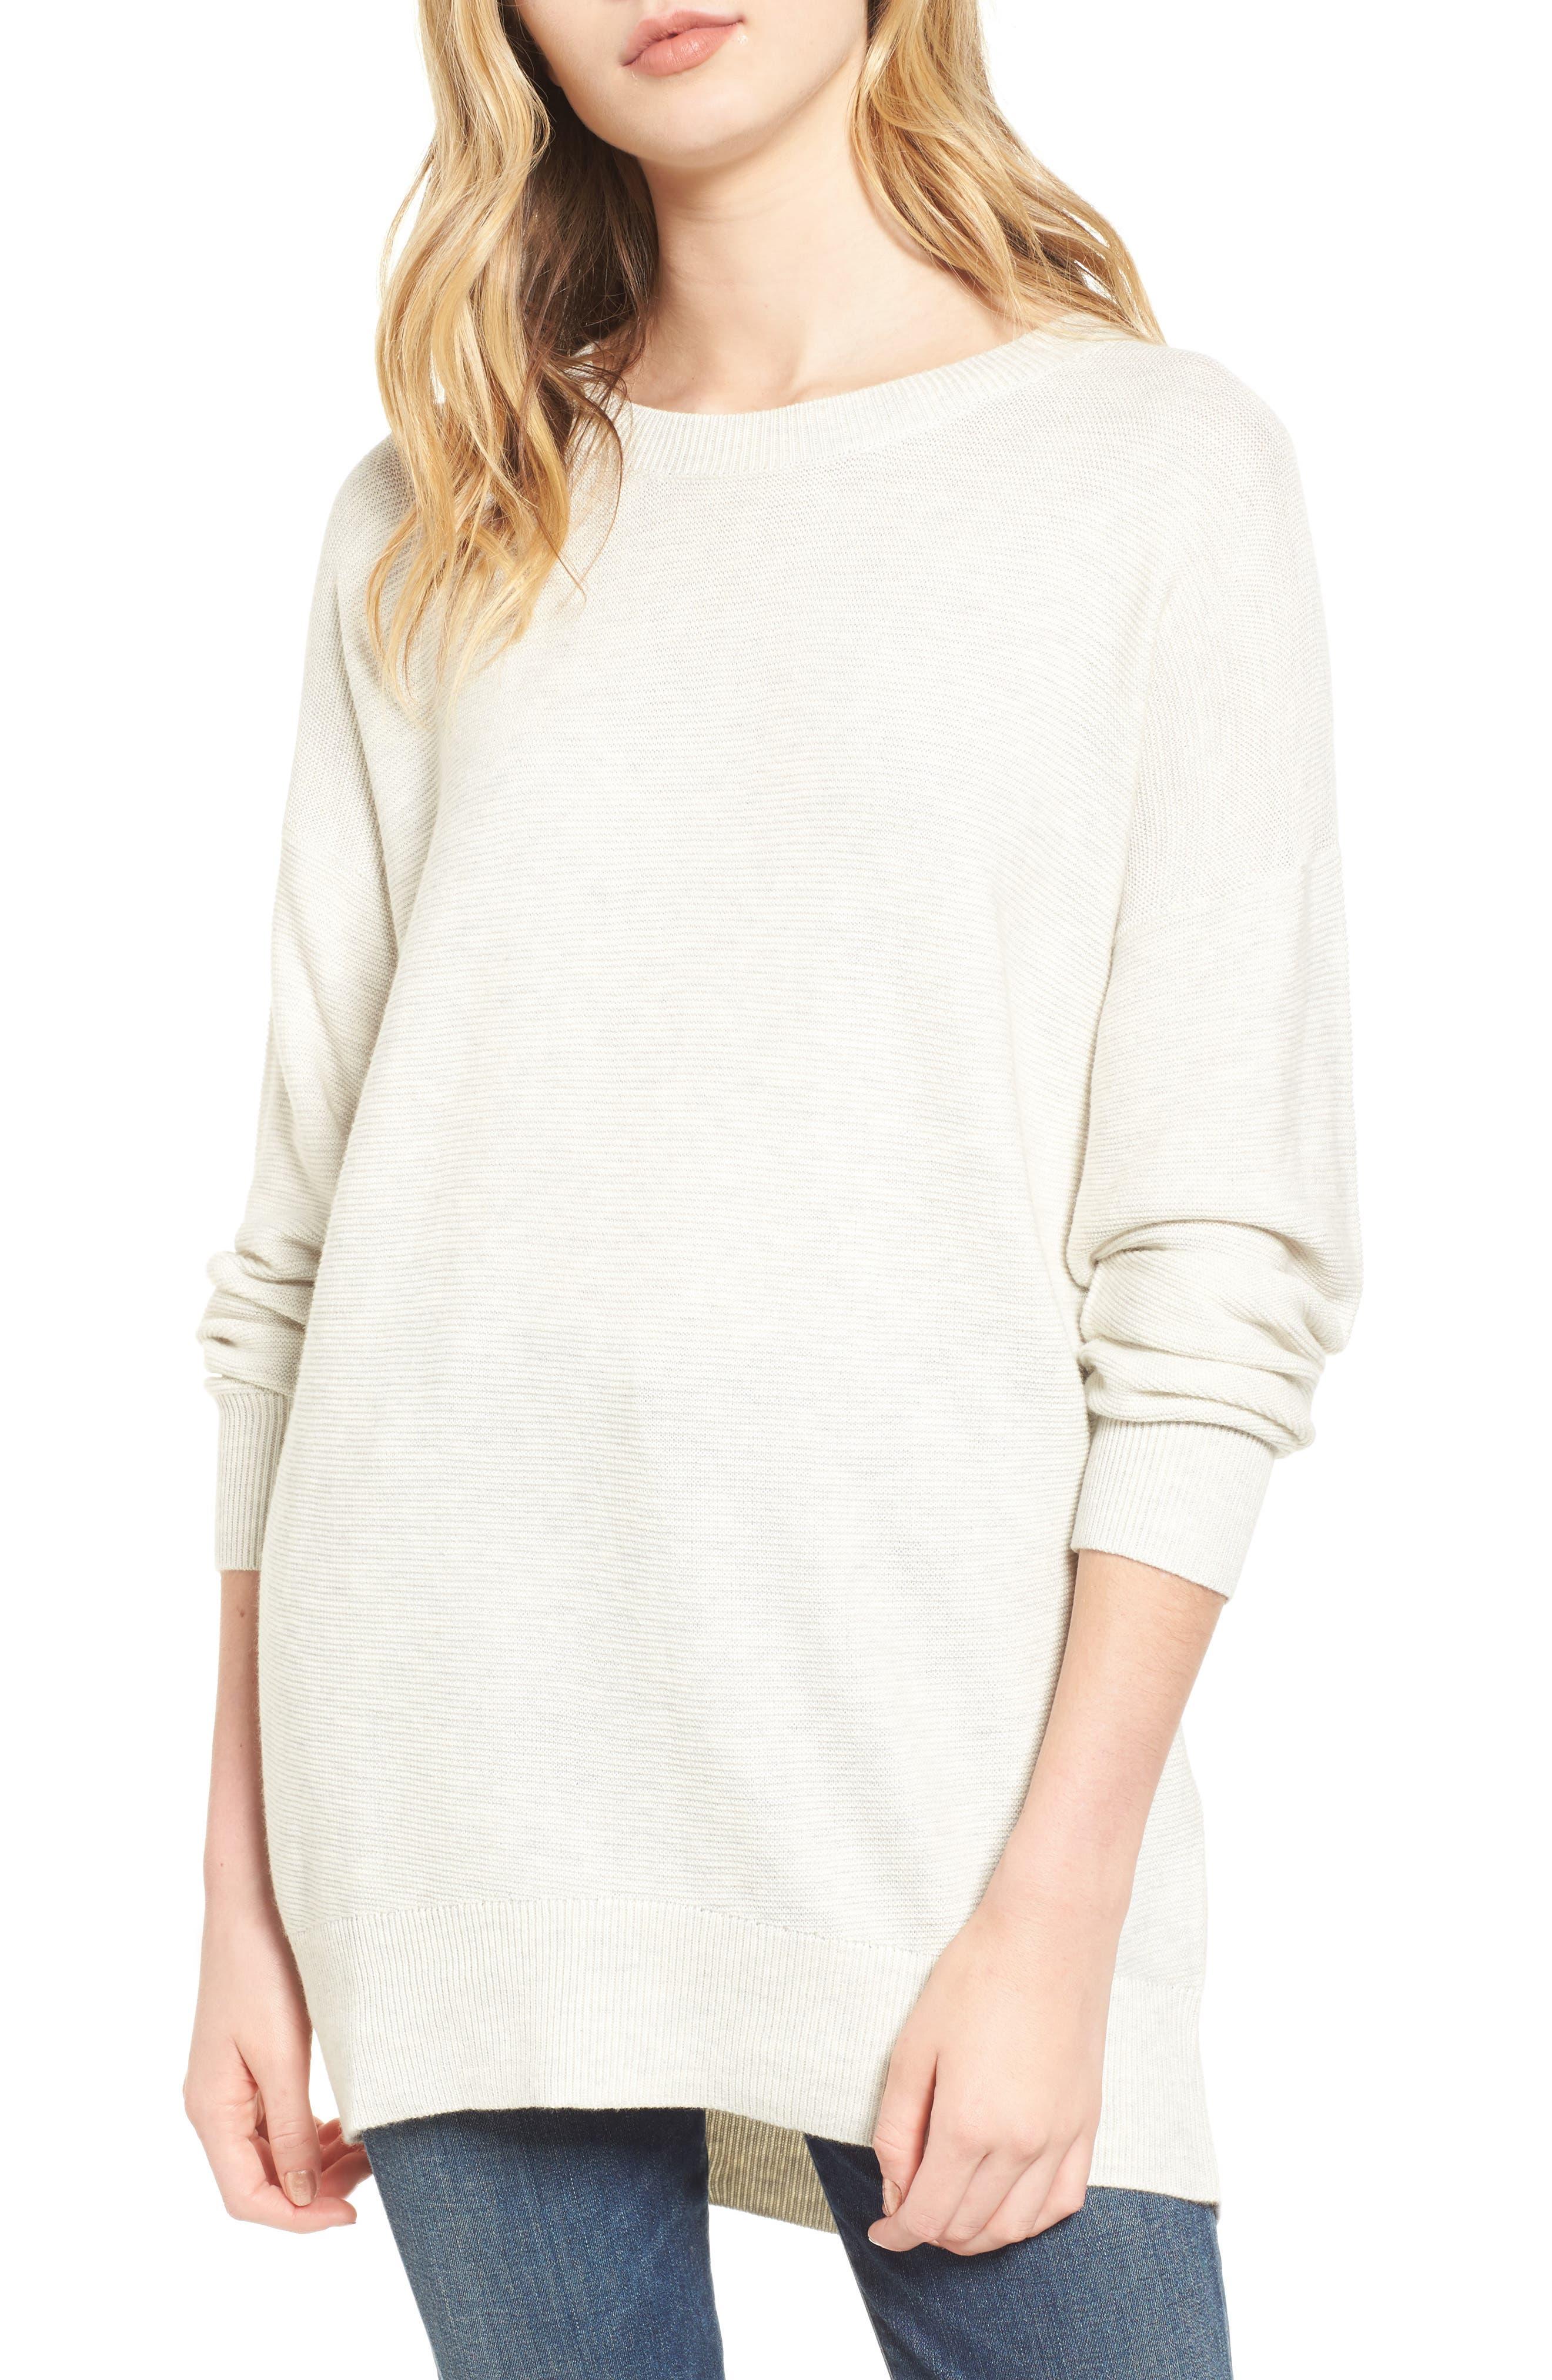 Splendid Laced Back Sweater